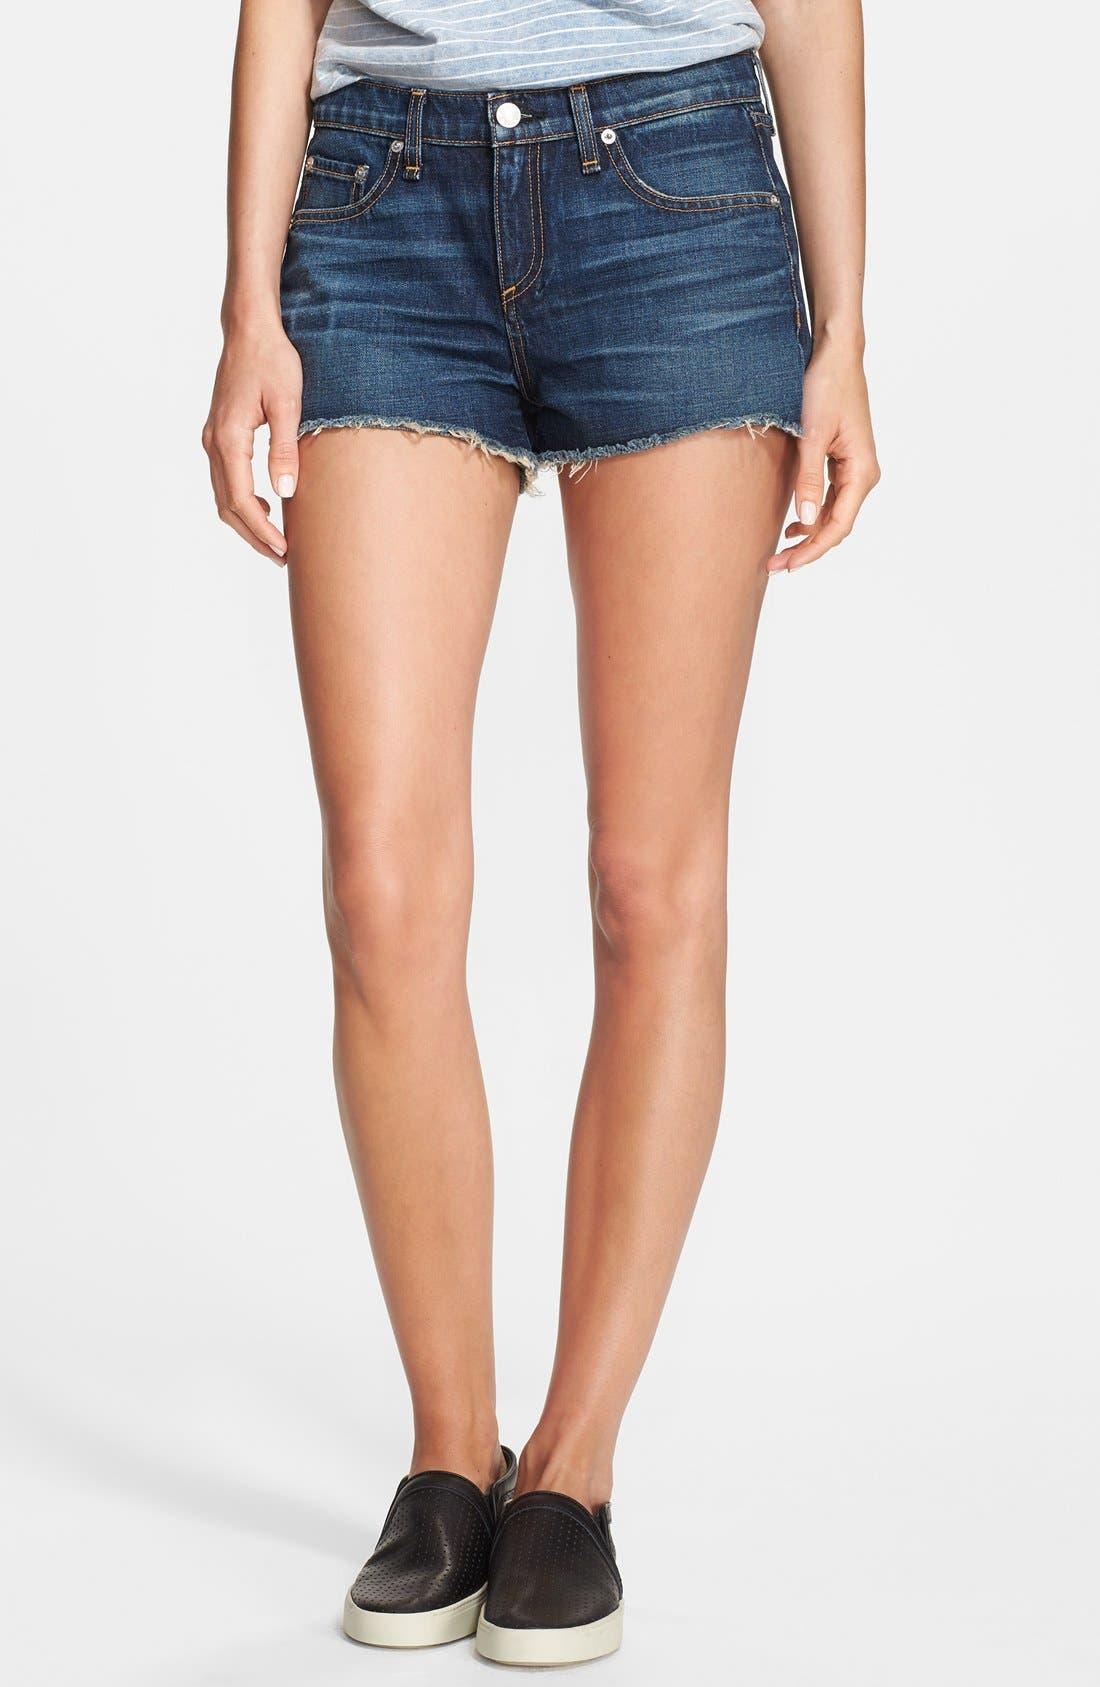 Alternate Image 1 Selected - rag & bone/JEAN 'The Mila' Denim Cutoff Shorts (Doheny)